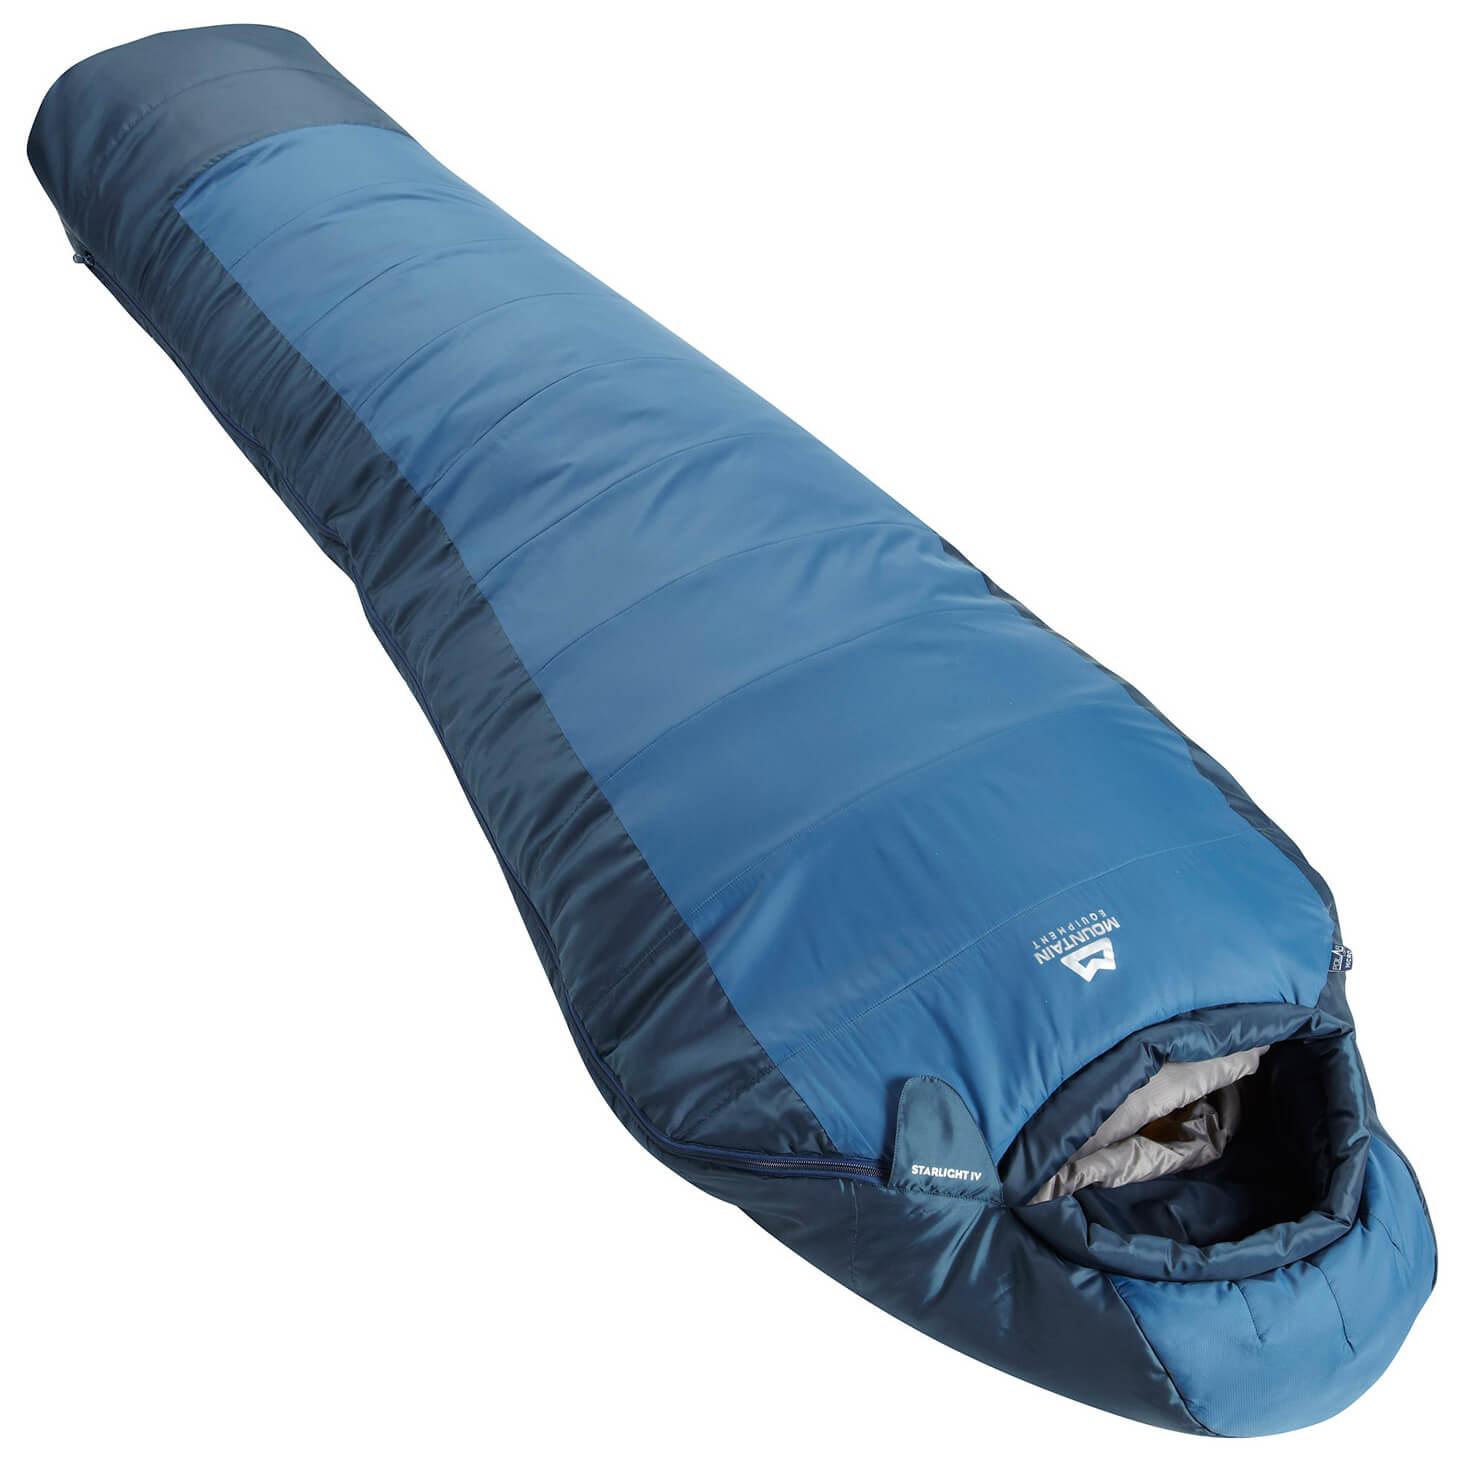 mountain-equipment-starlight-iv-synthetics-sleeping-bag-detail-2.jpg